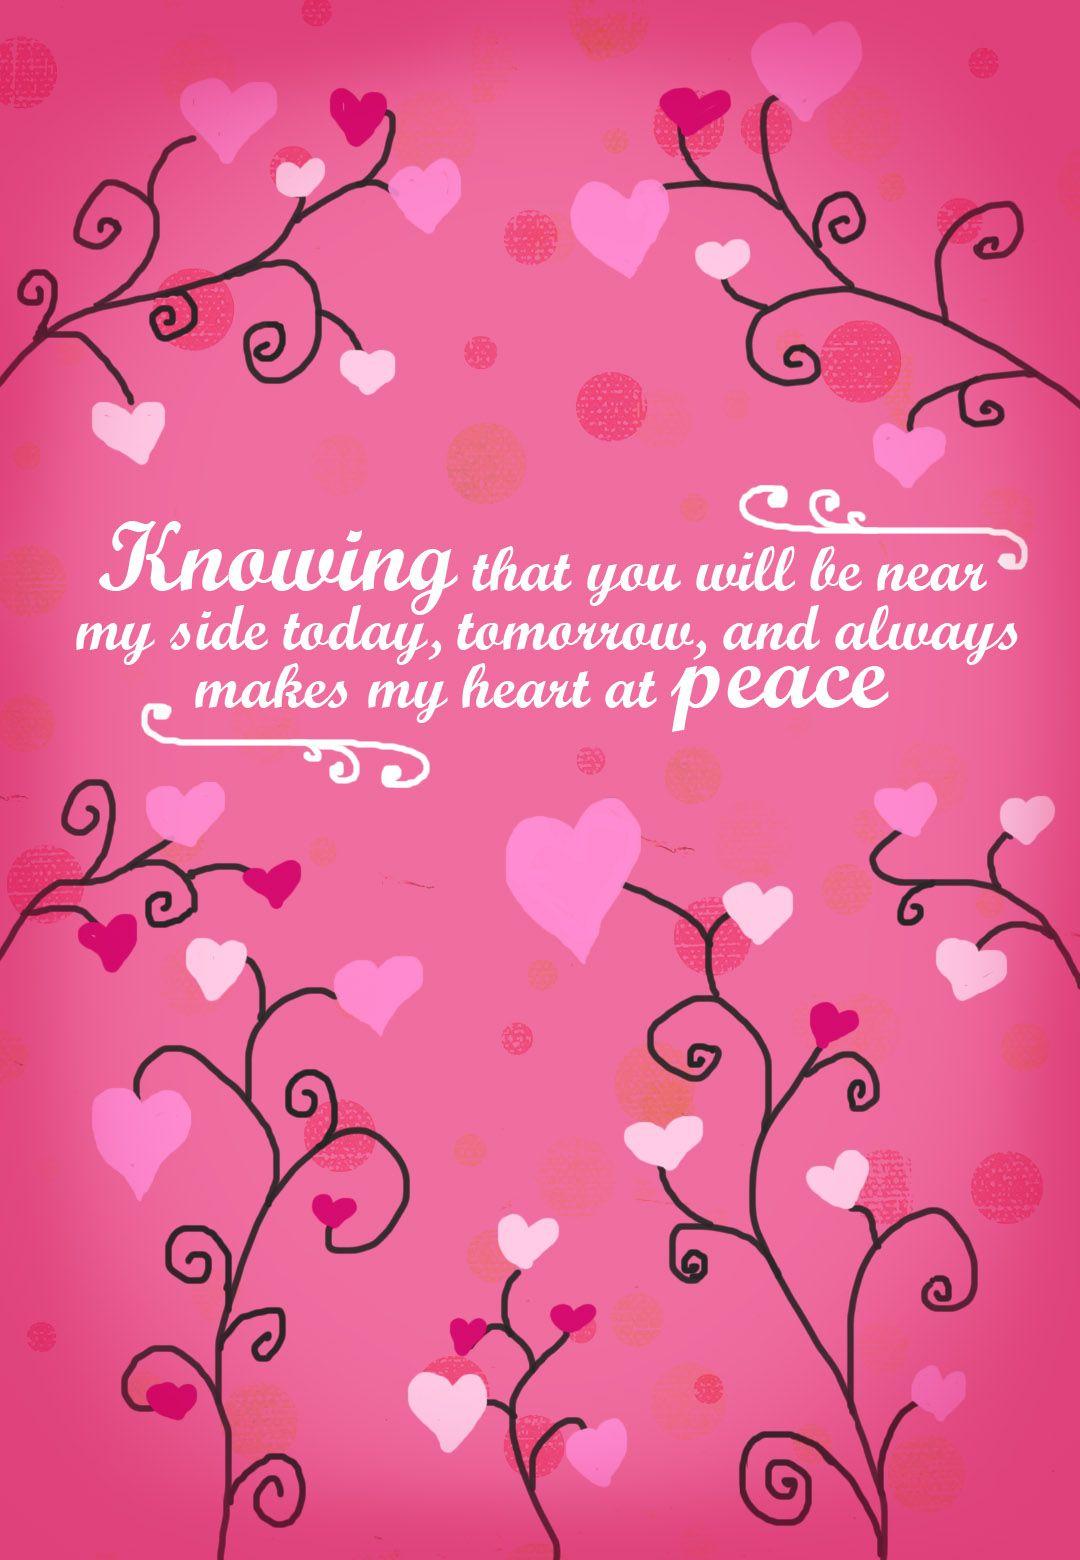 Free Printable Makes My Heart At Peace Greeting Card Love Cards Cards Printable Cards